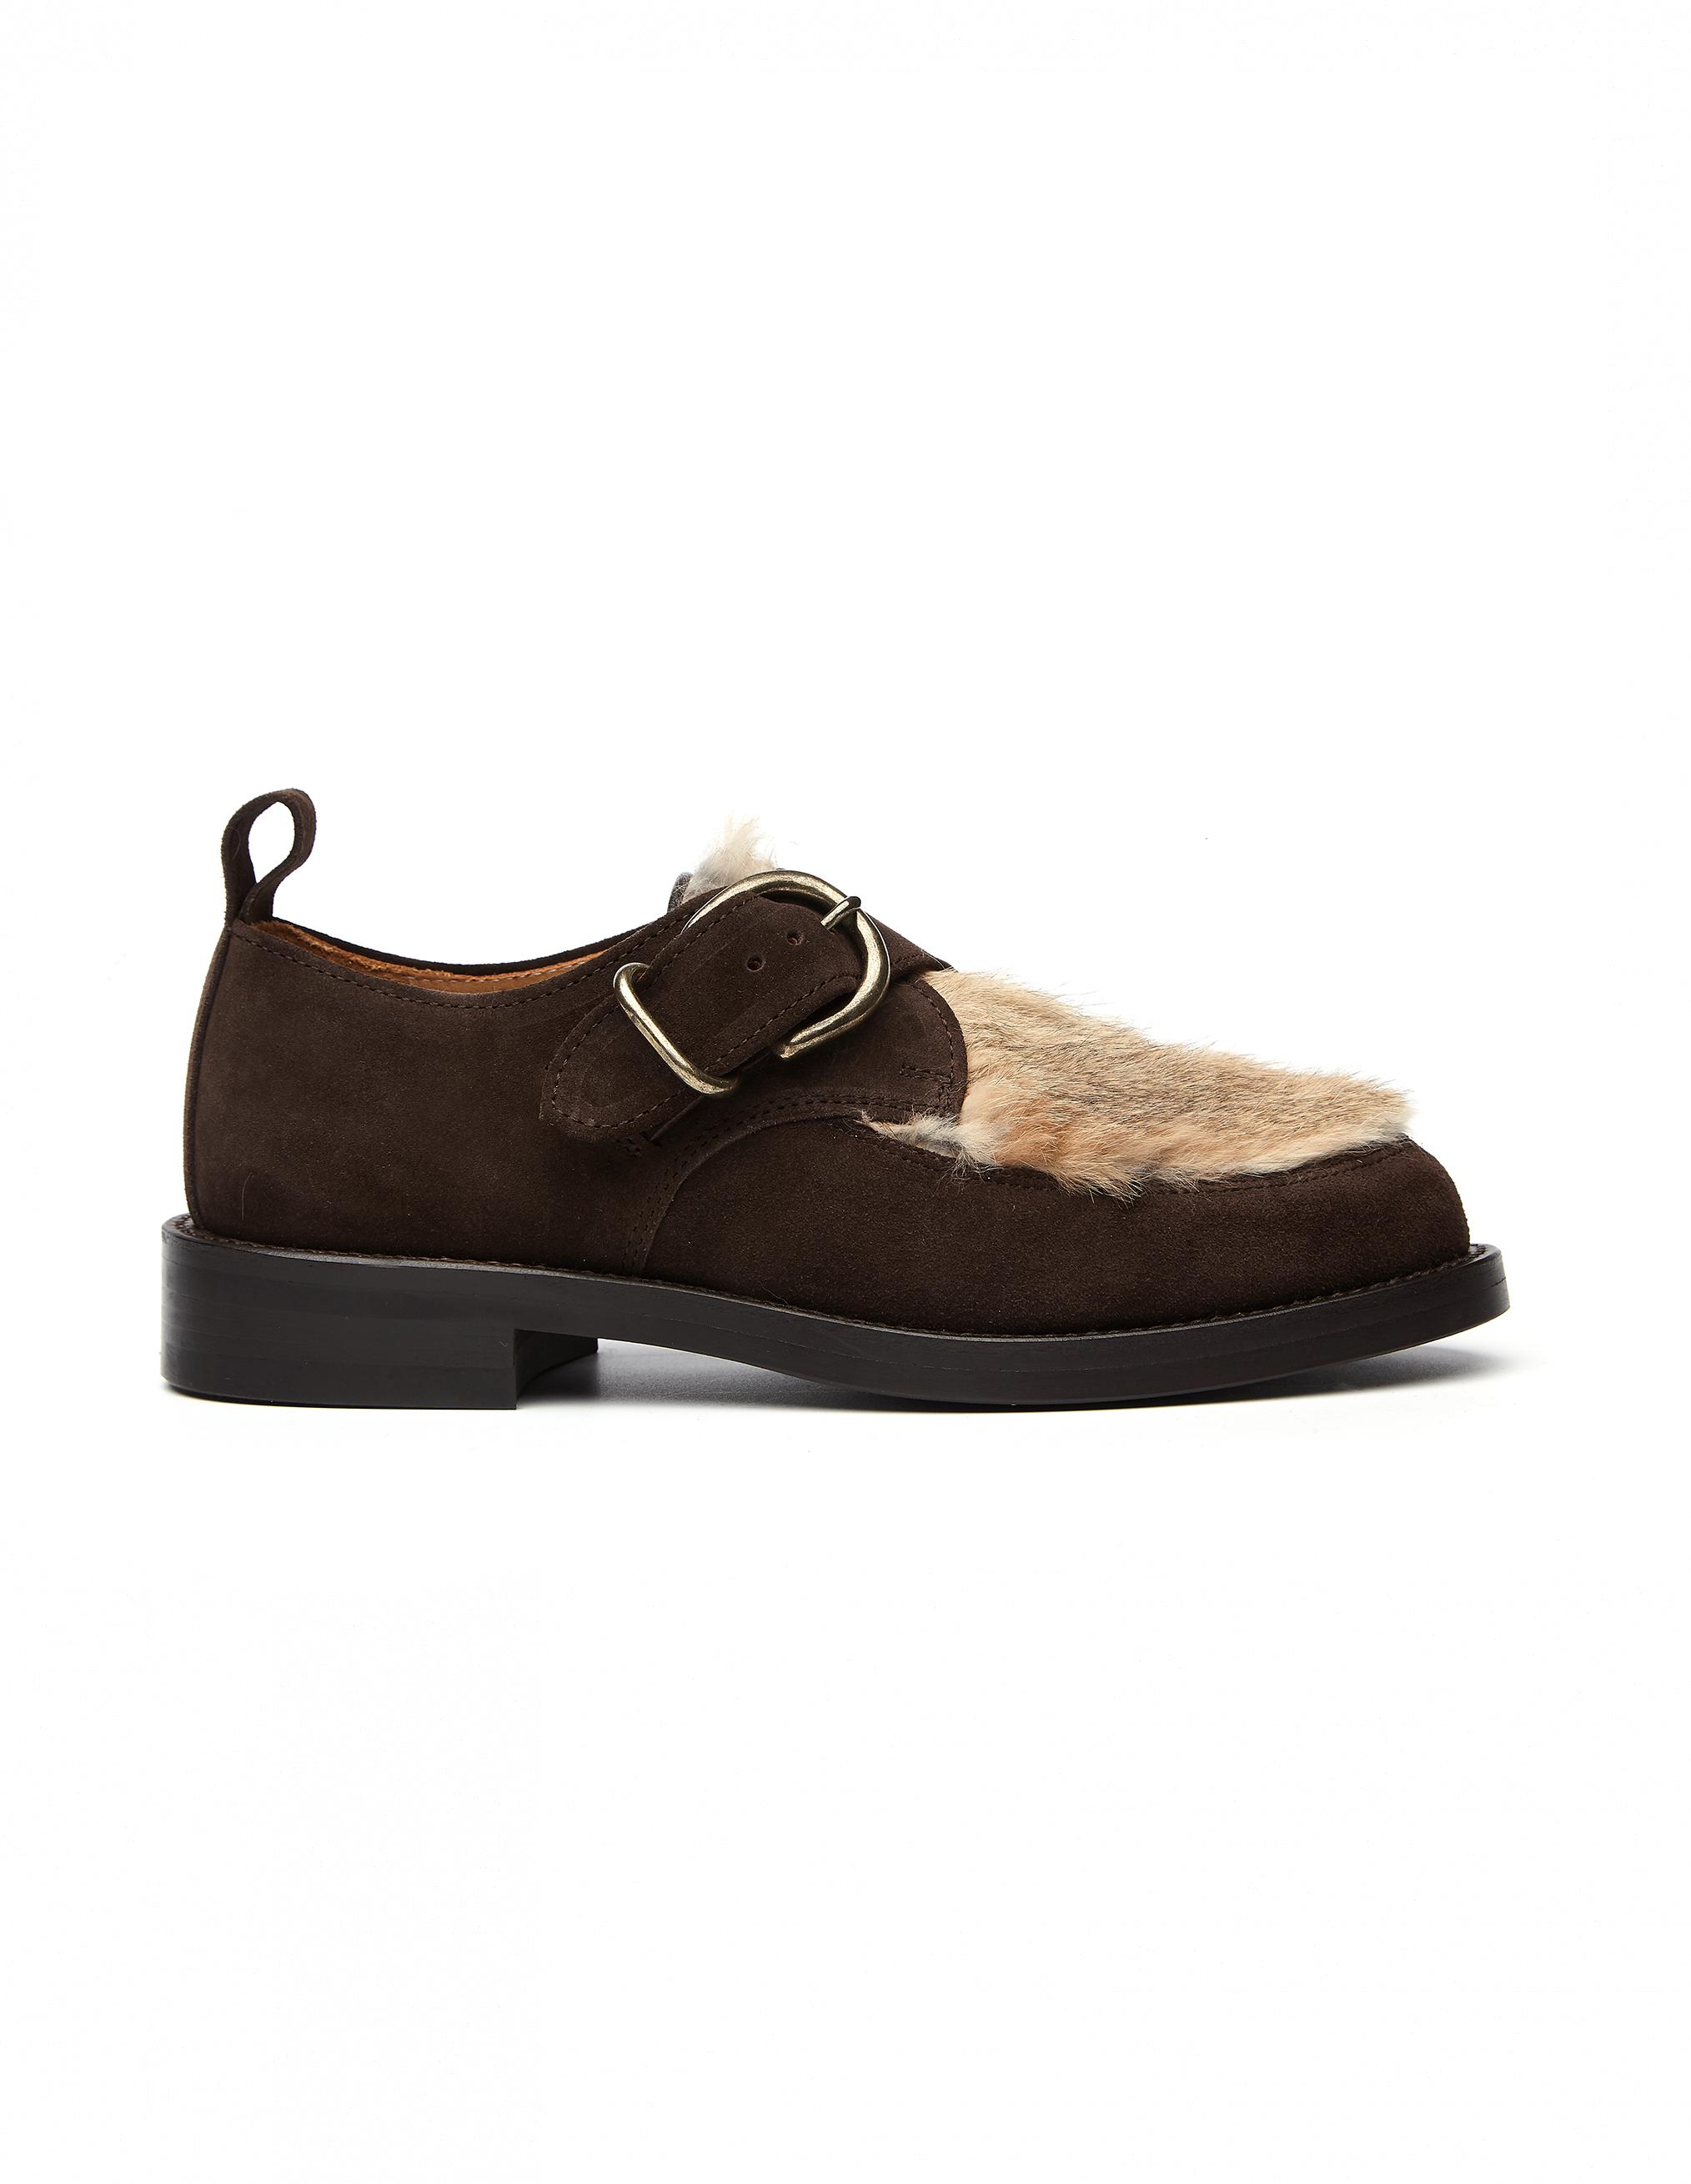 Hender Scheme Monk Shoes with Rabbit Fur Decor